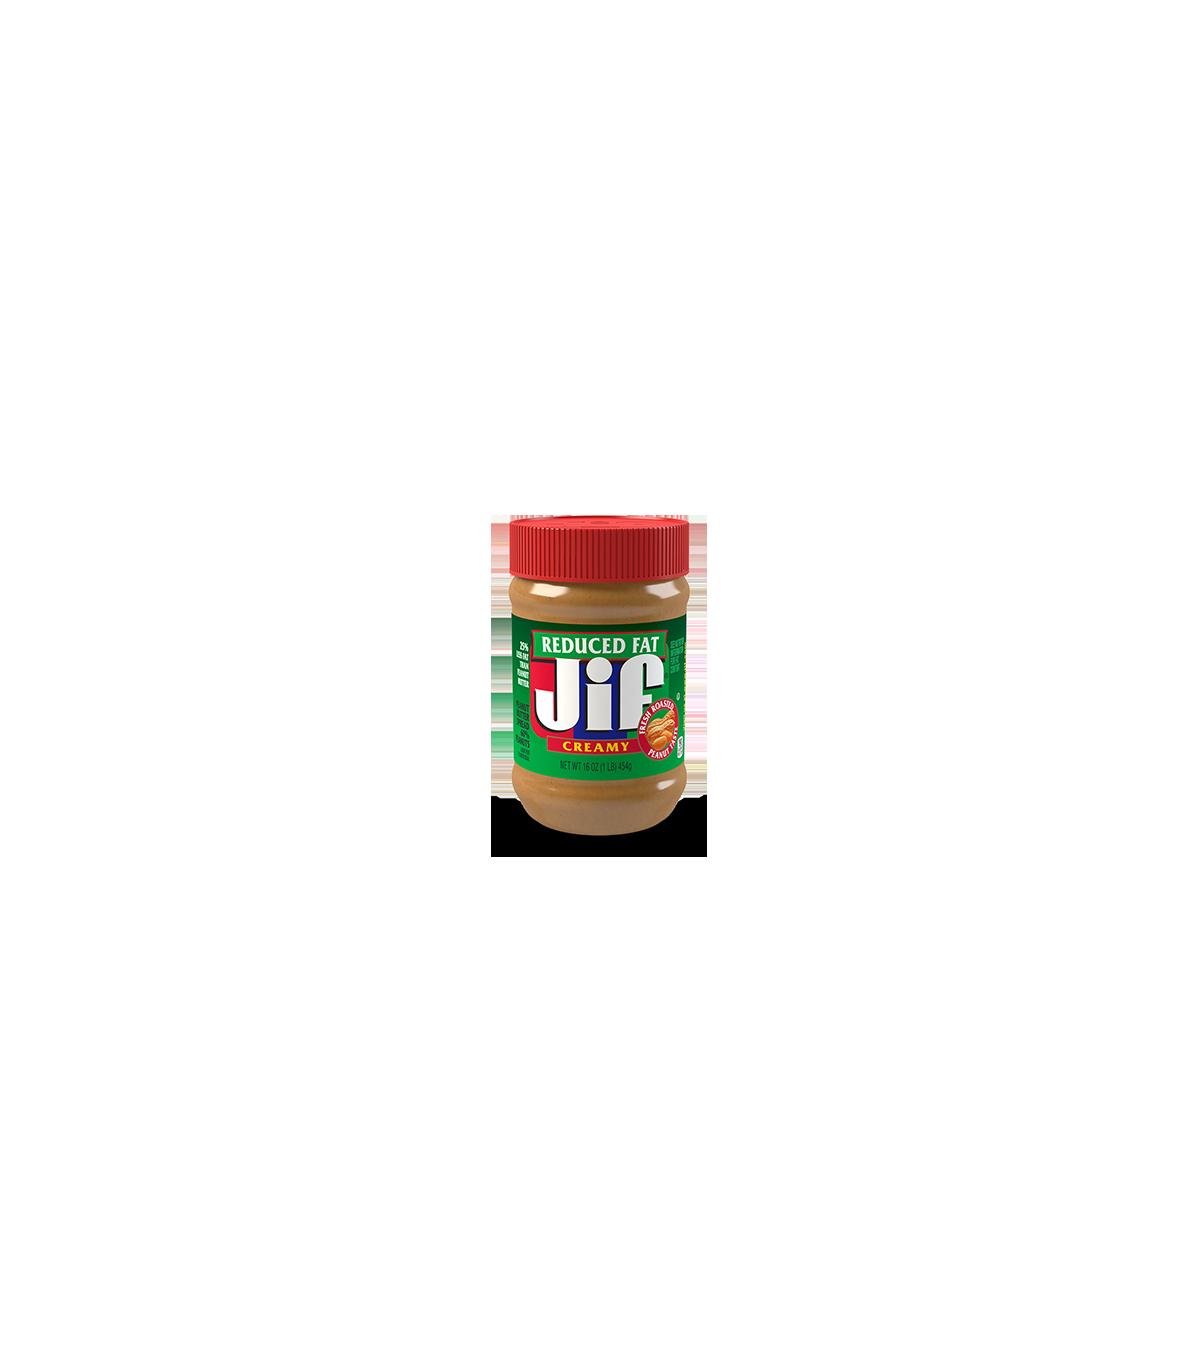 Jif کره بادام زمینی کم چربی کرمی جیف